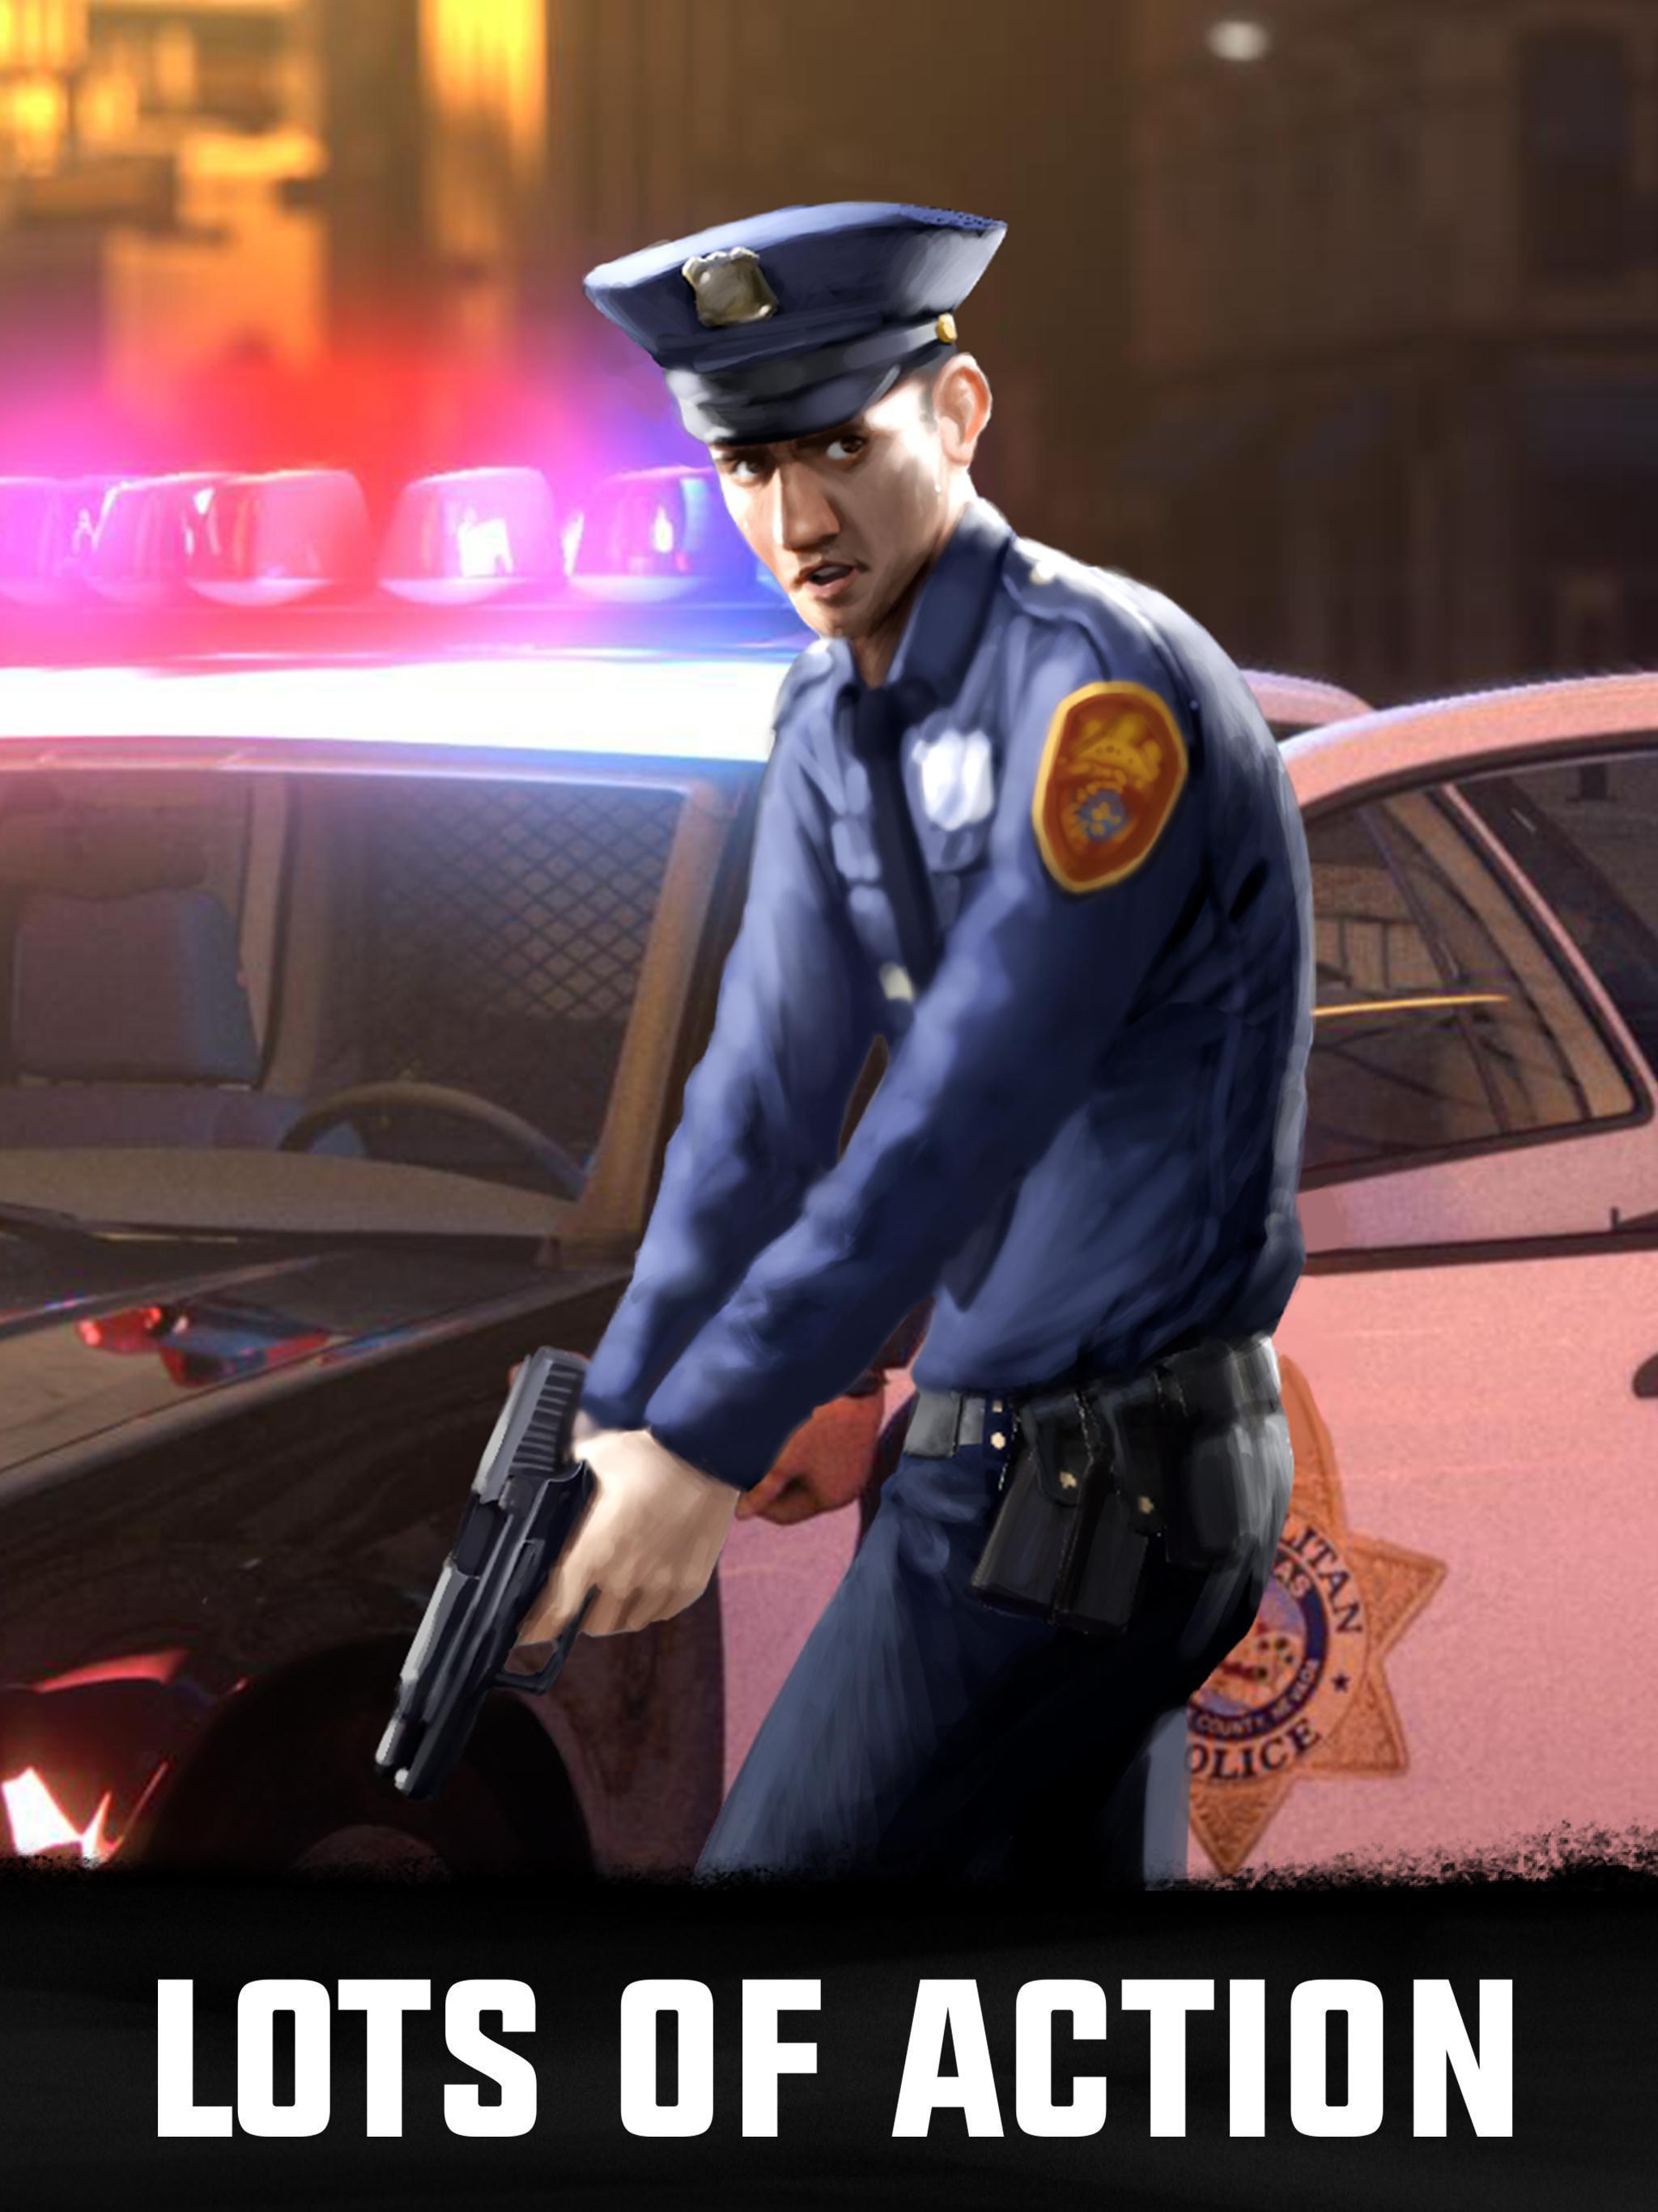 Sniper 3D Fun Free Online FPS Shooting Game 3.15.1 Screenshot 2